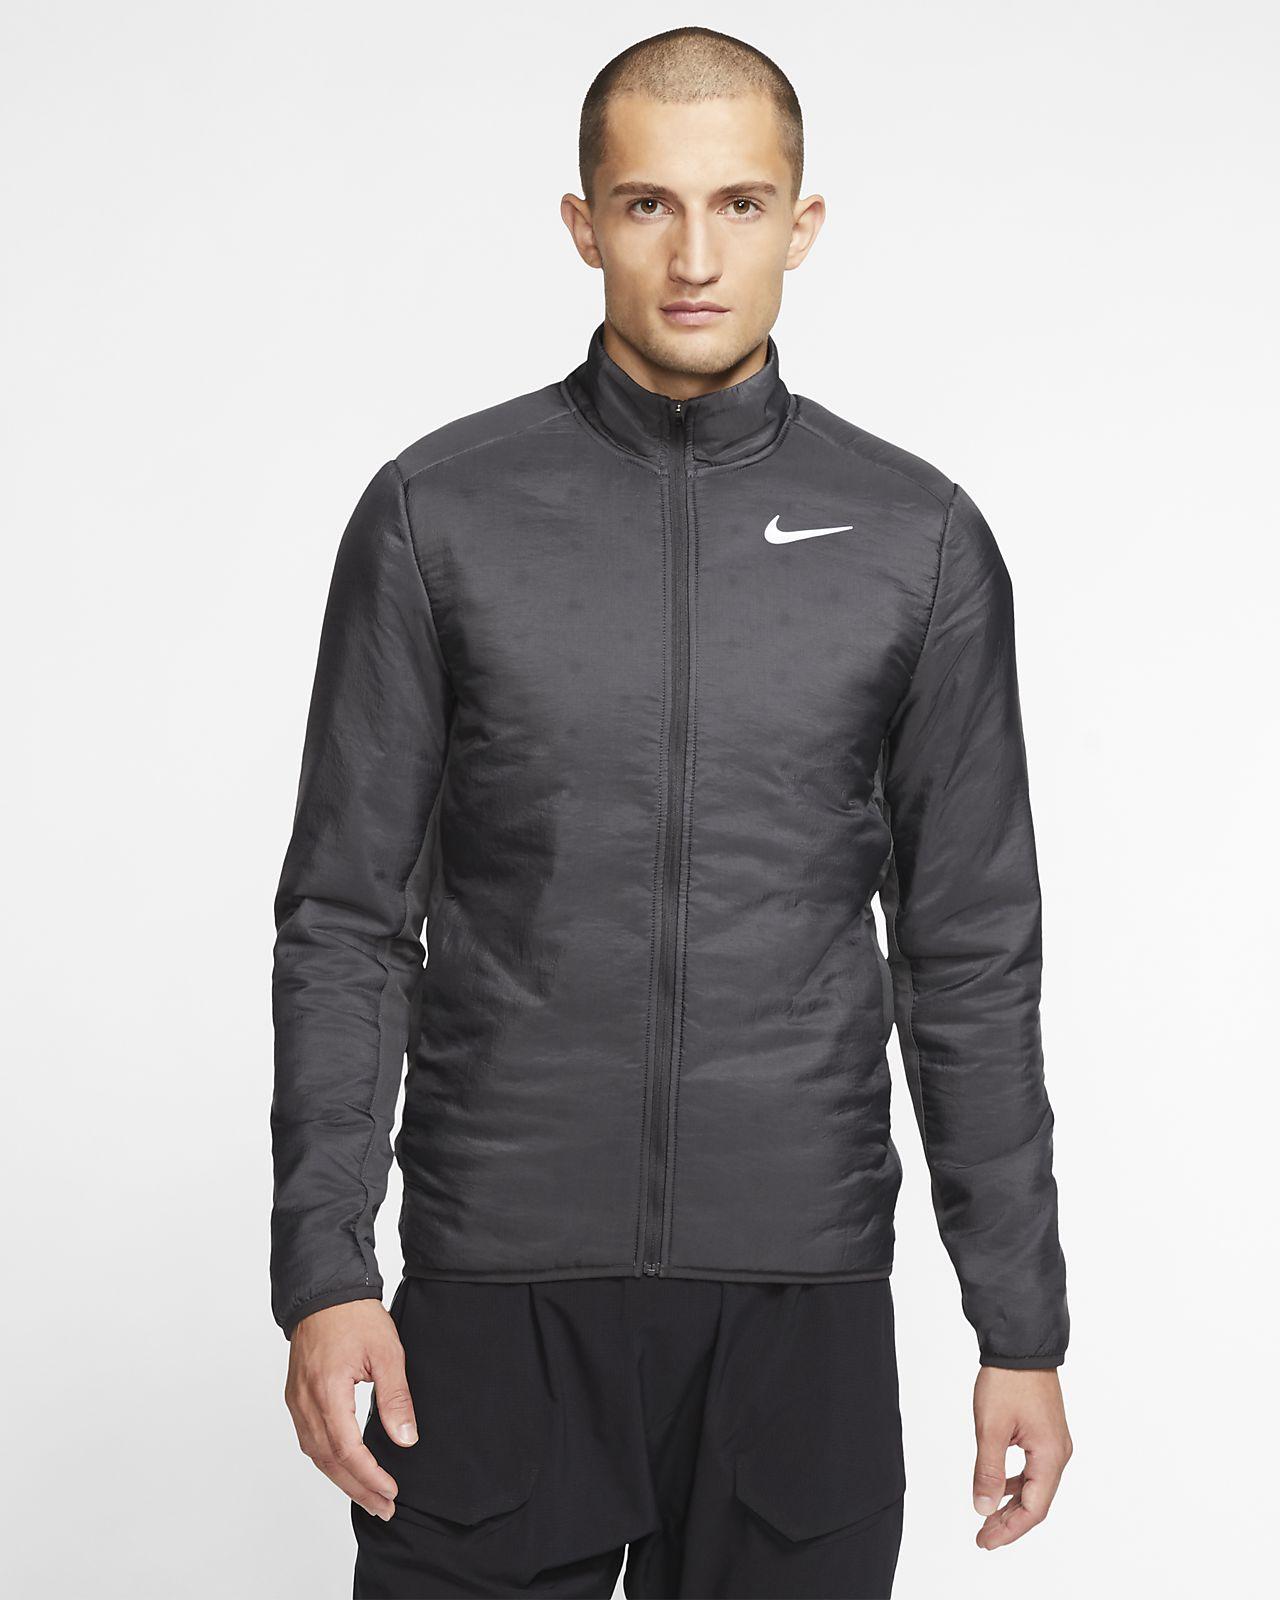 Giacca da running Nike AeroLayer - Uomo